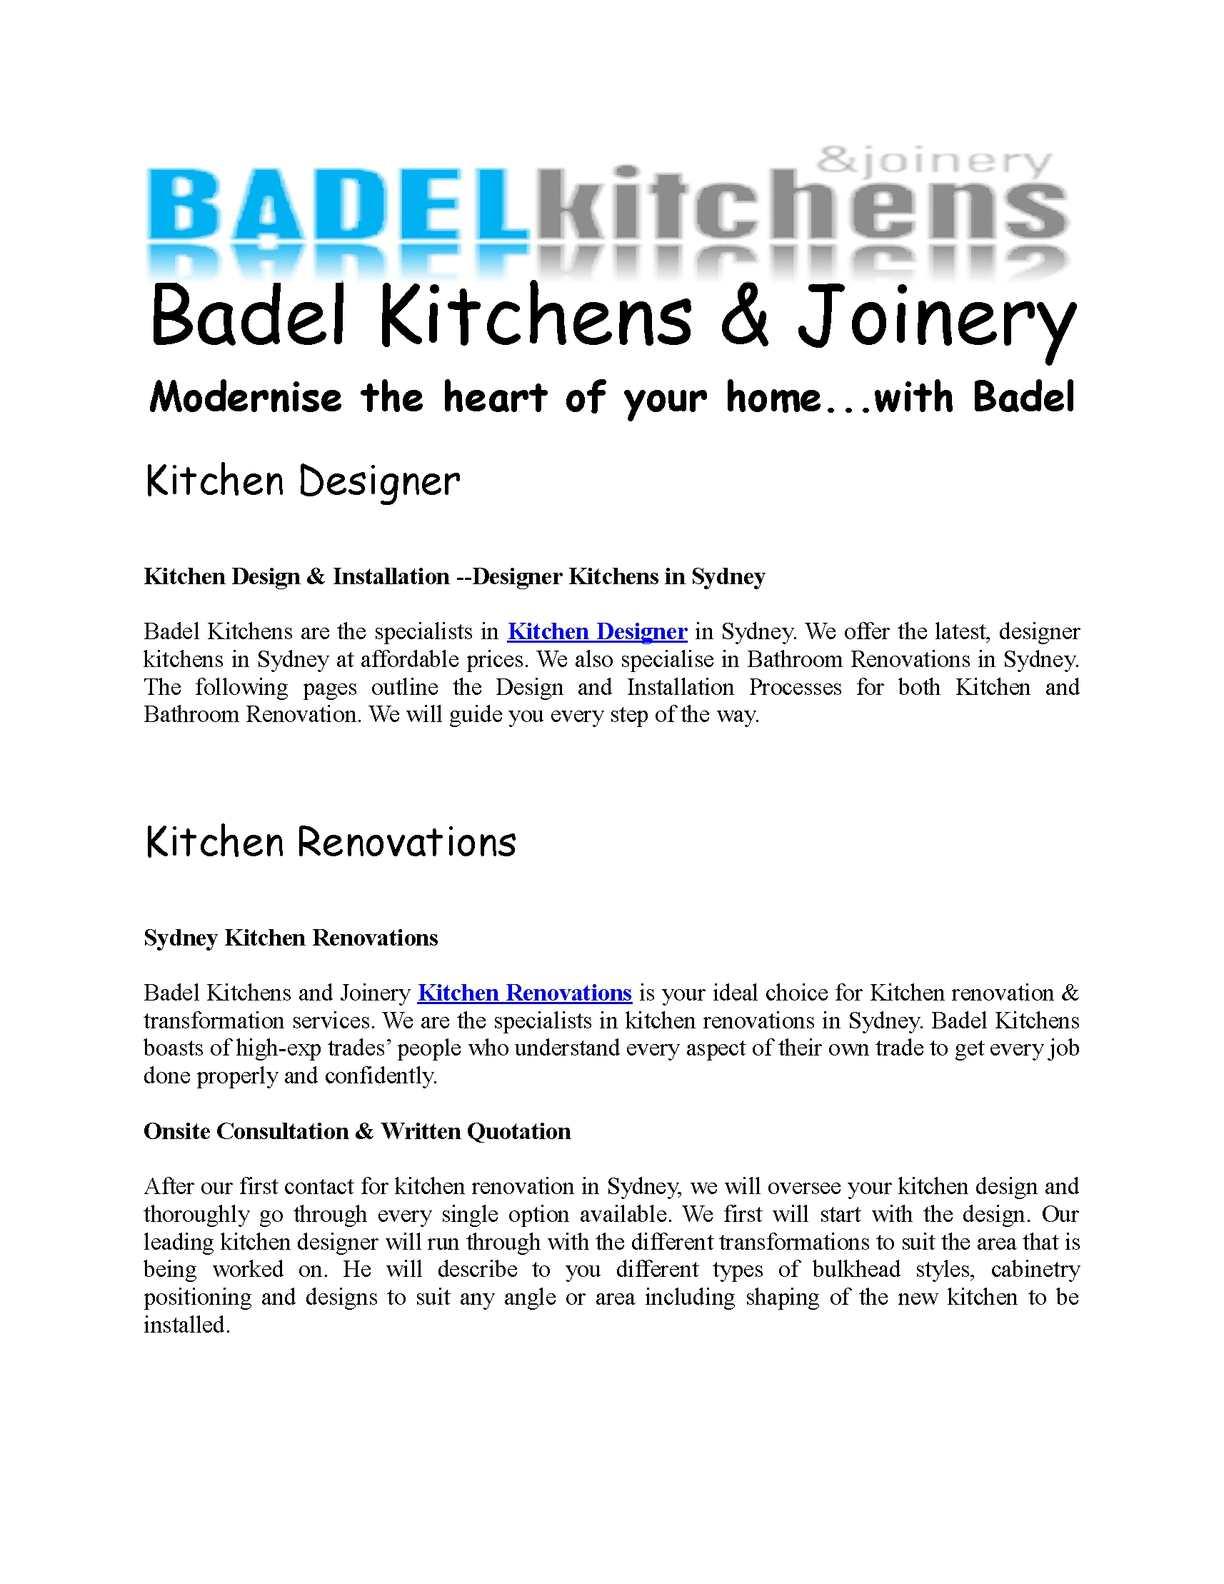 Calaméo - Morden Kitchens in Sydney